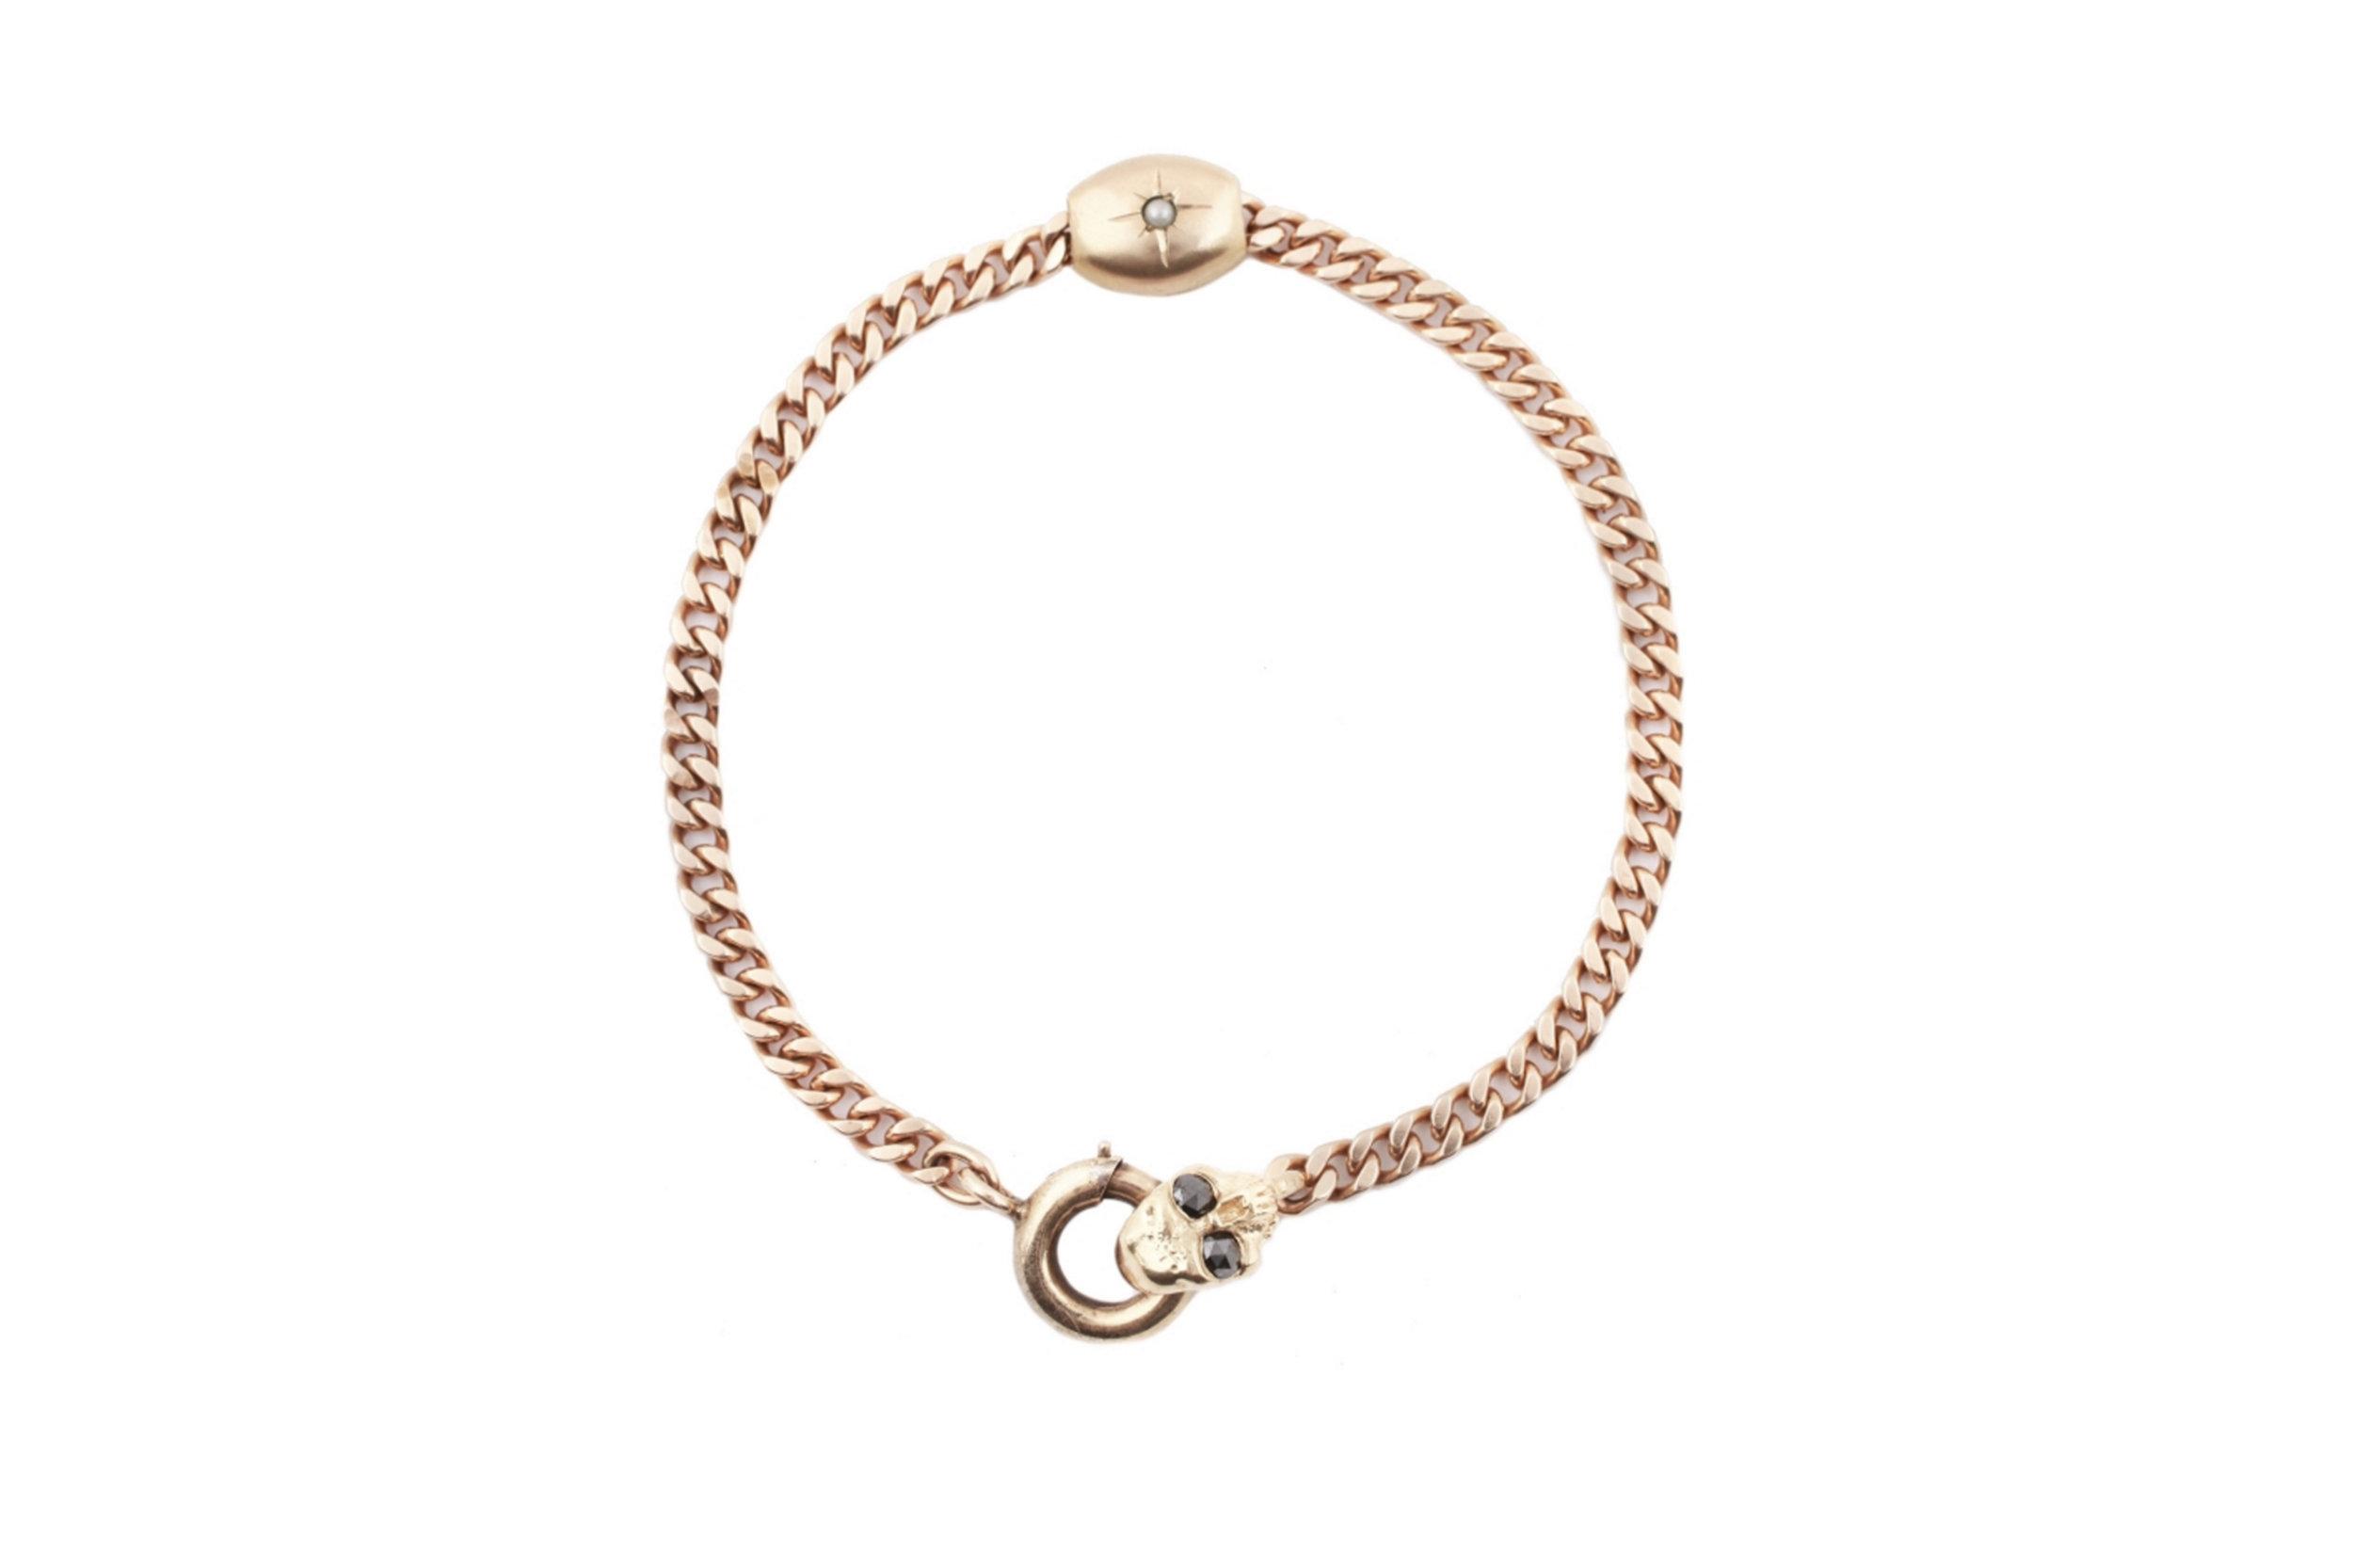 14k skull clasp bracelet.jpg